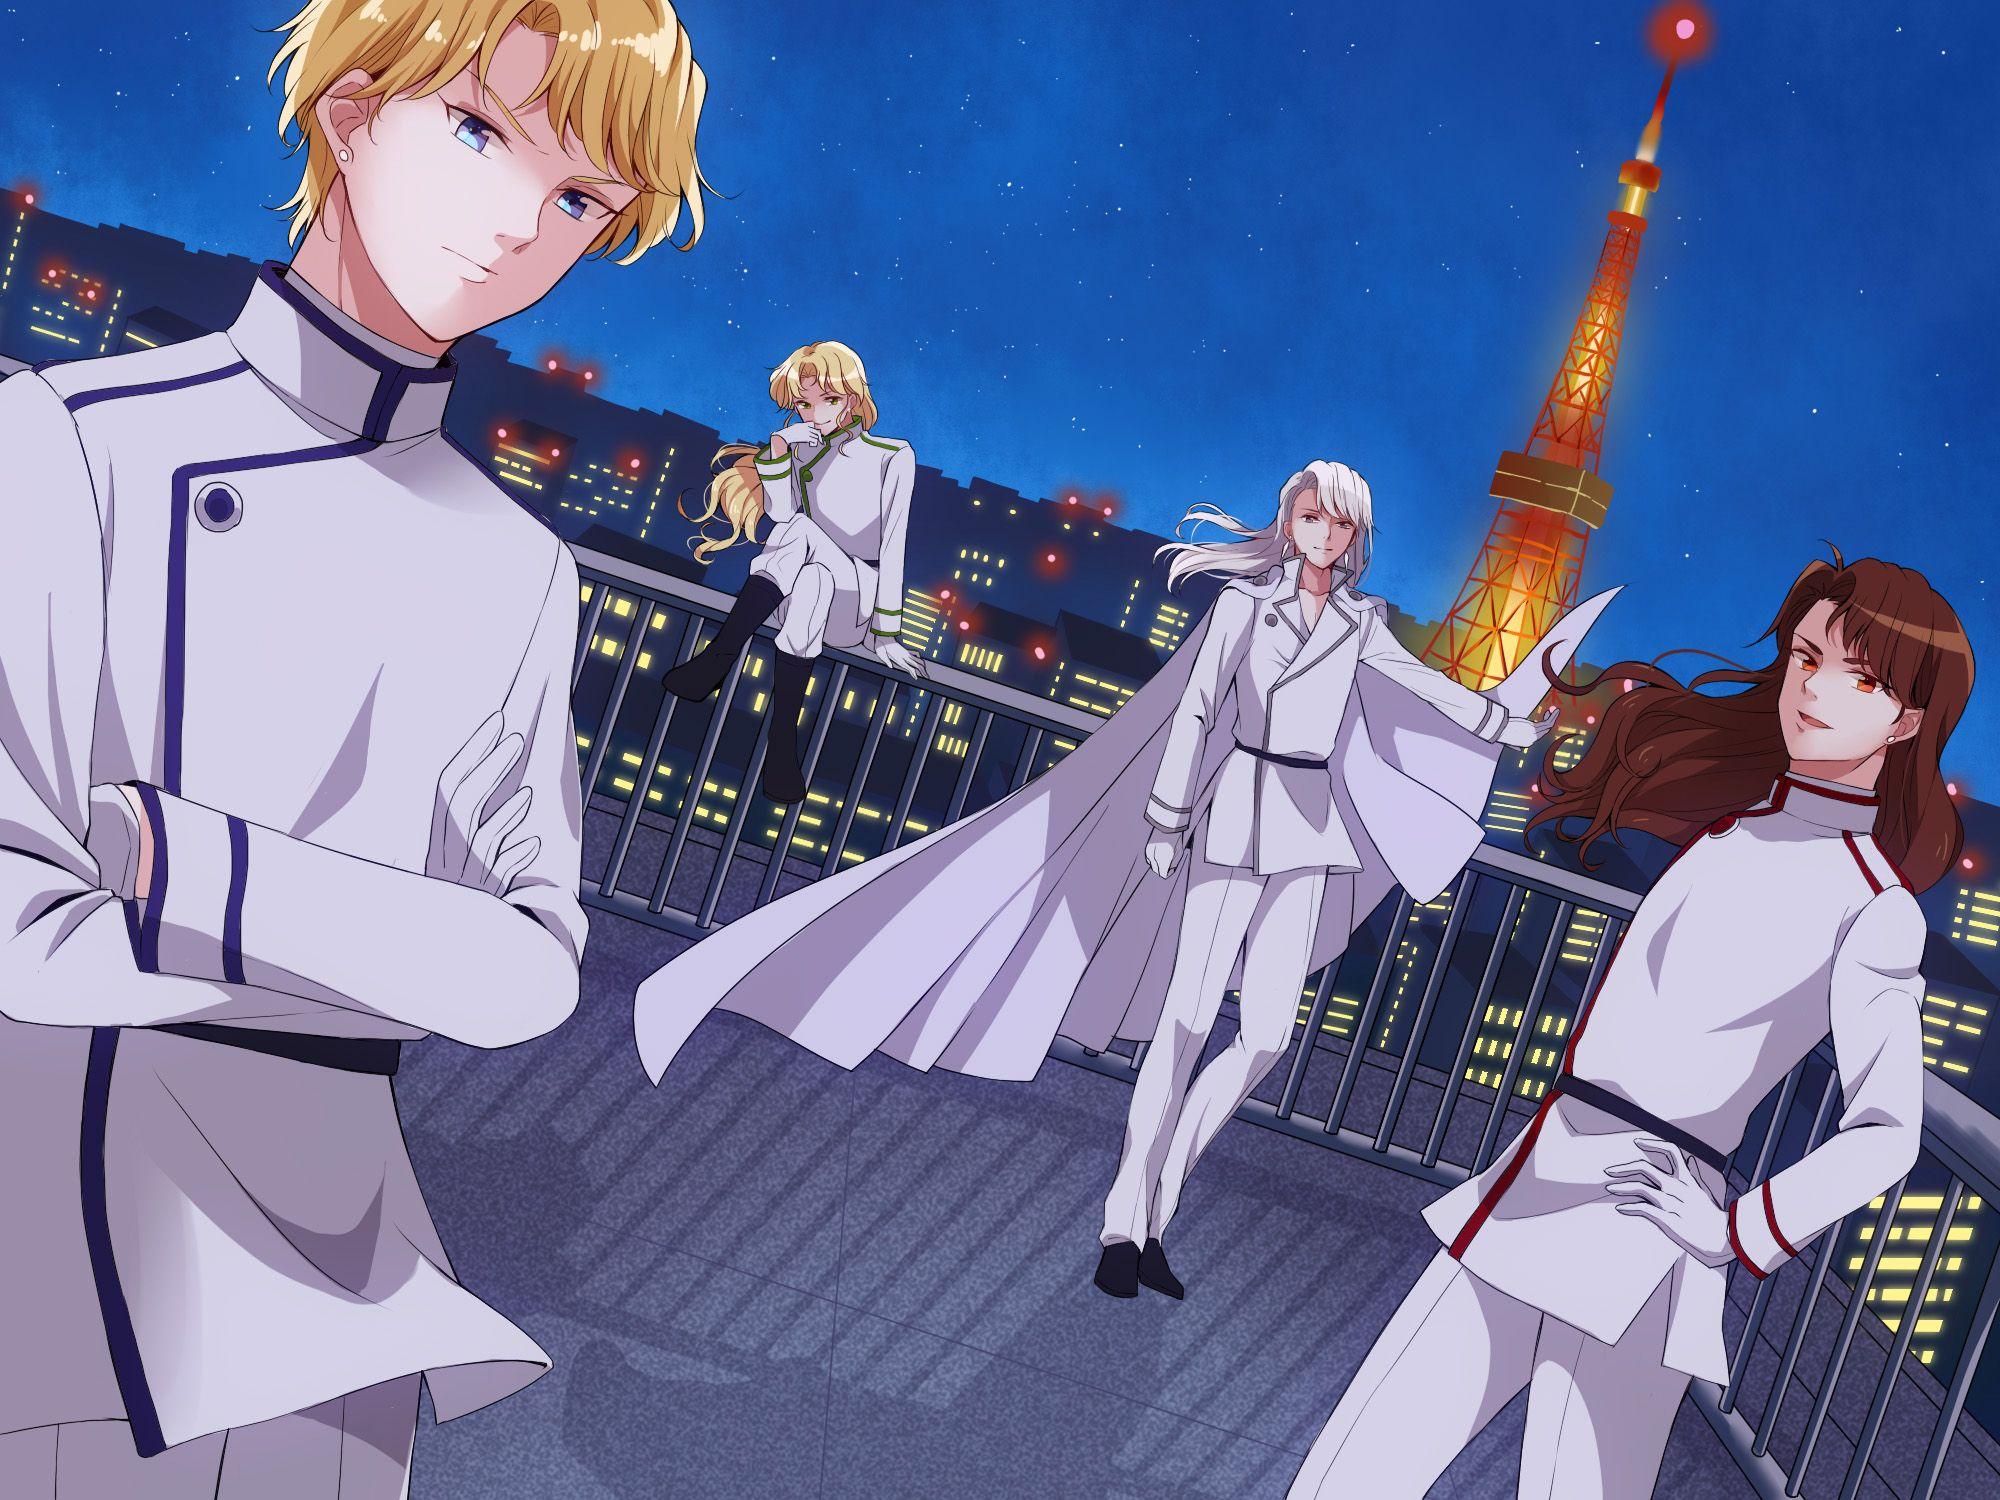 Bishoujo Senshi Sailor Moon, Zoisite, Nephrite, Kunzite